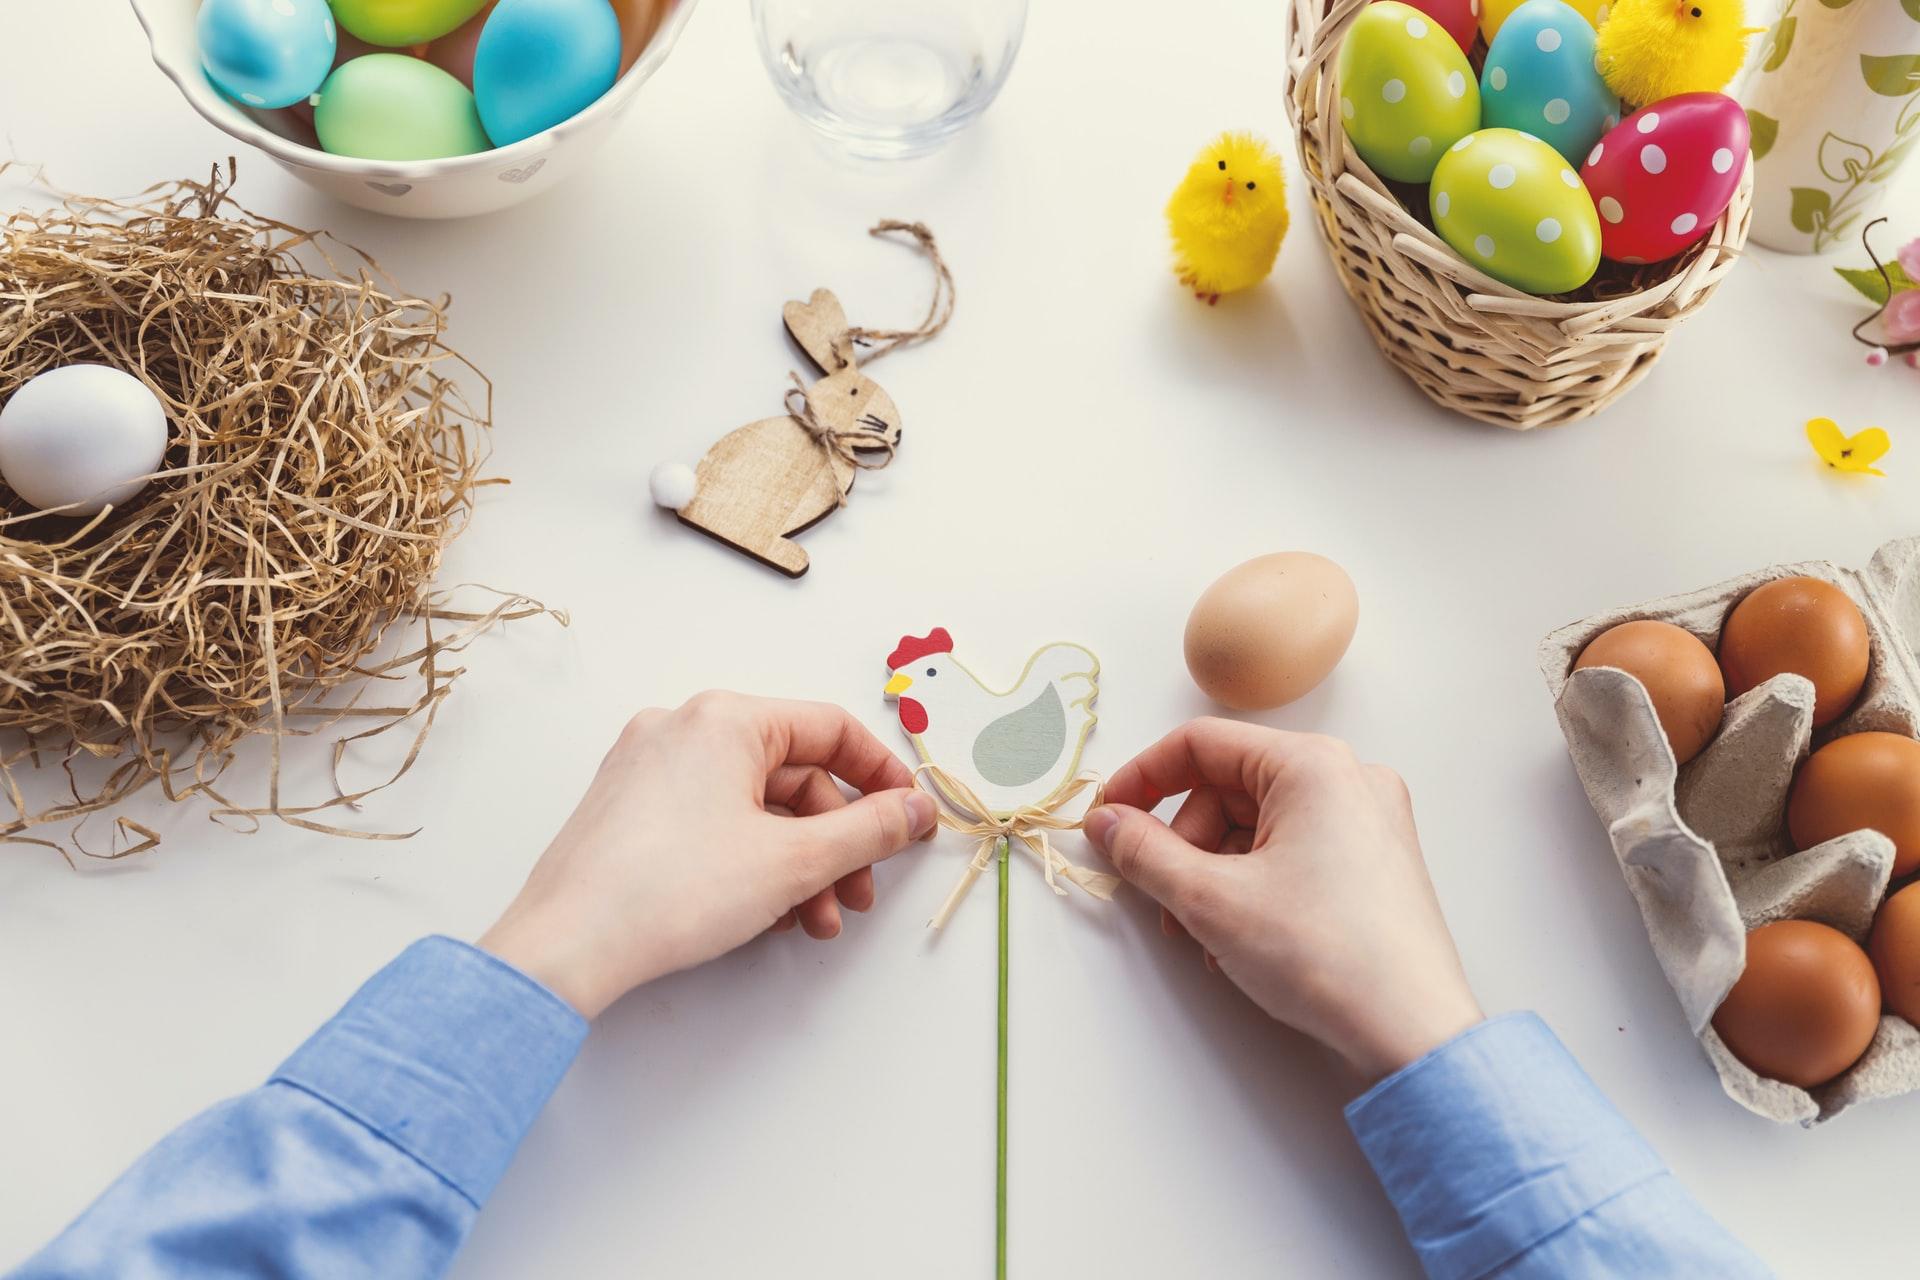 Teremtsünk magunk köré húsvéti hangulatot